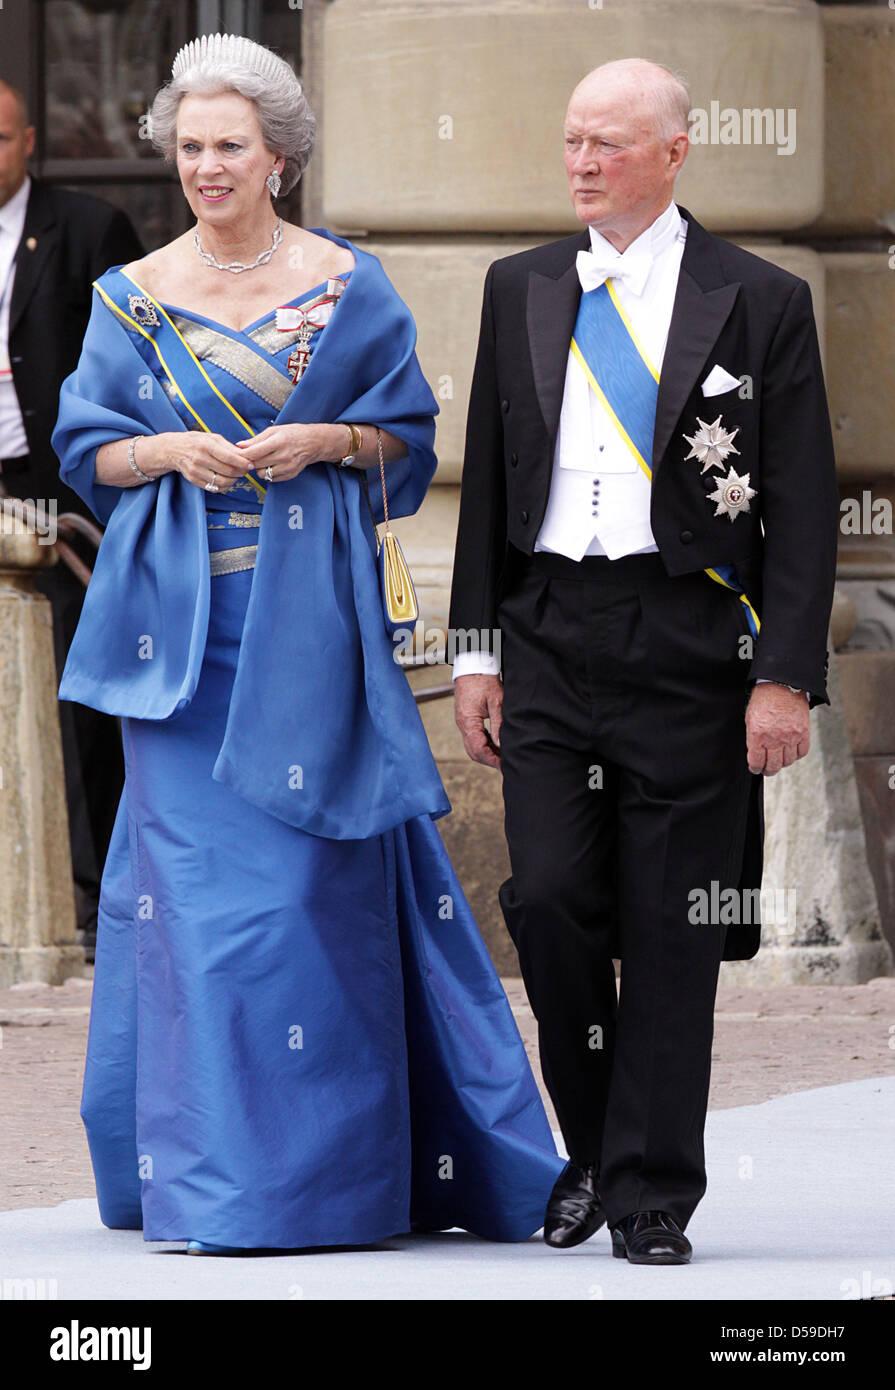 Princess Benedikte of Denmark and Prince Richard of Sayn-Wittgenstein-Berleburg arrive for the wedding of Crown - Stock Image